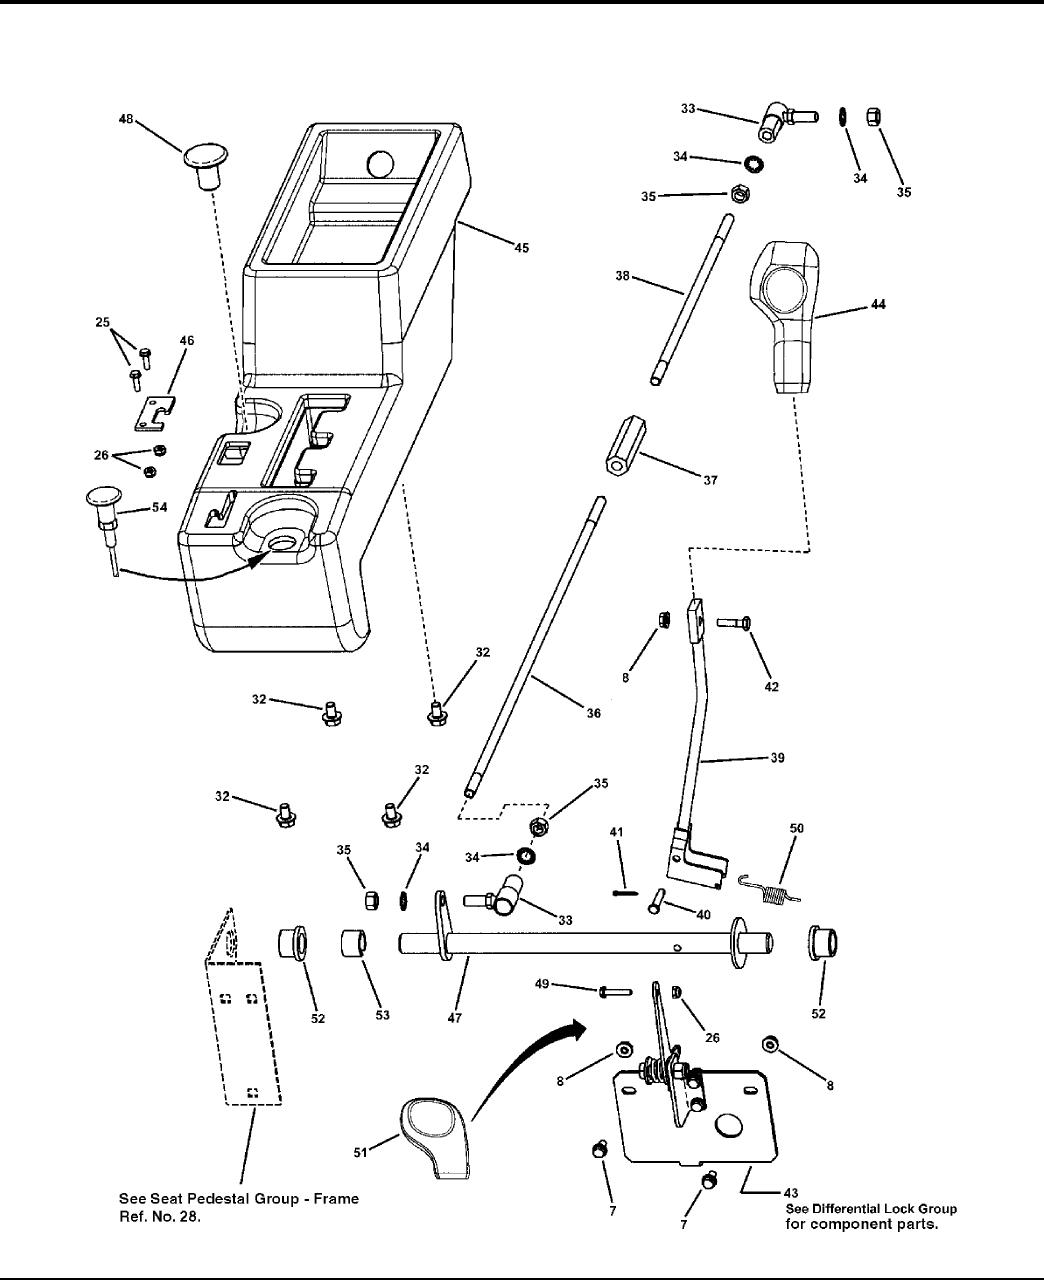 simplicity 85632 parts manual turf trail cruiser Wiring Mess seat pedestal group controls